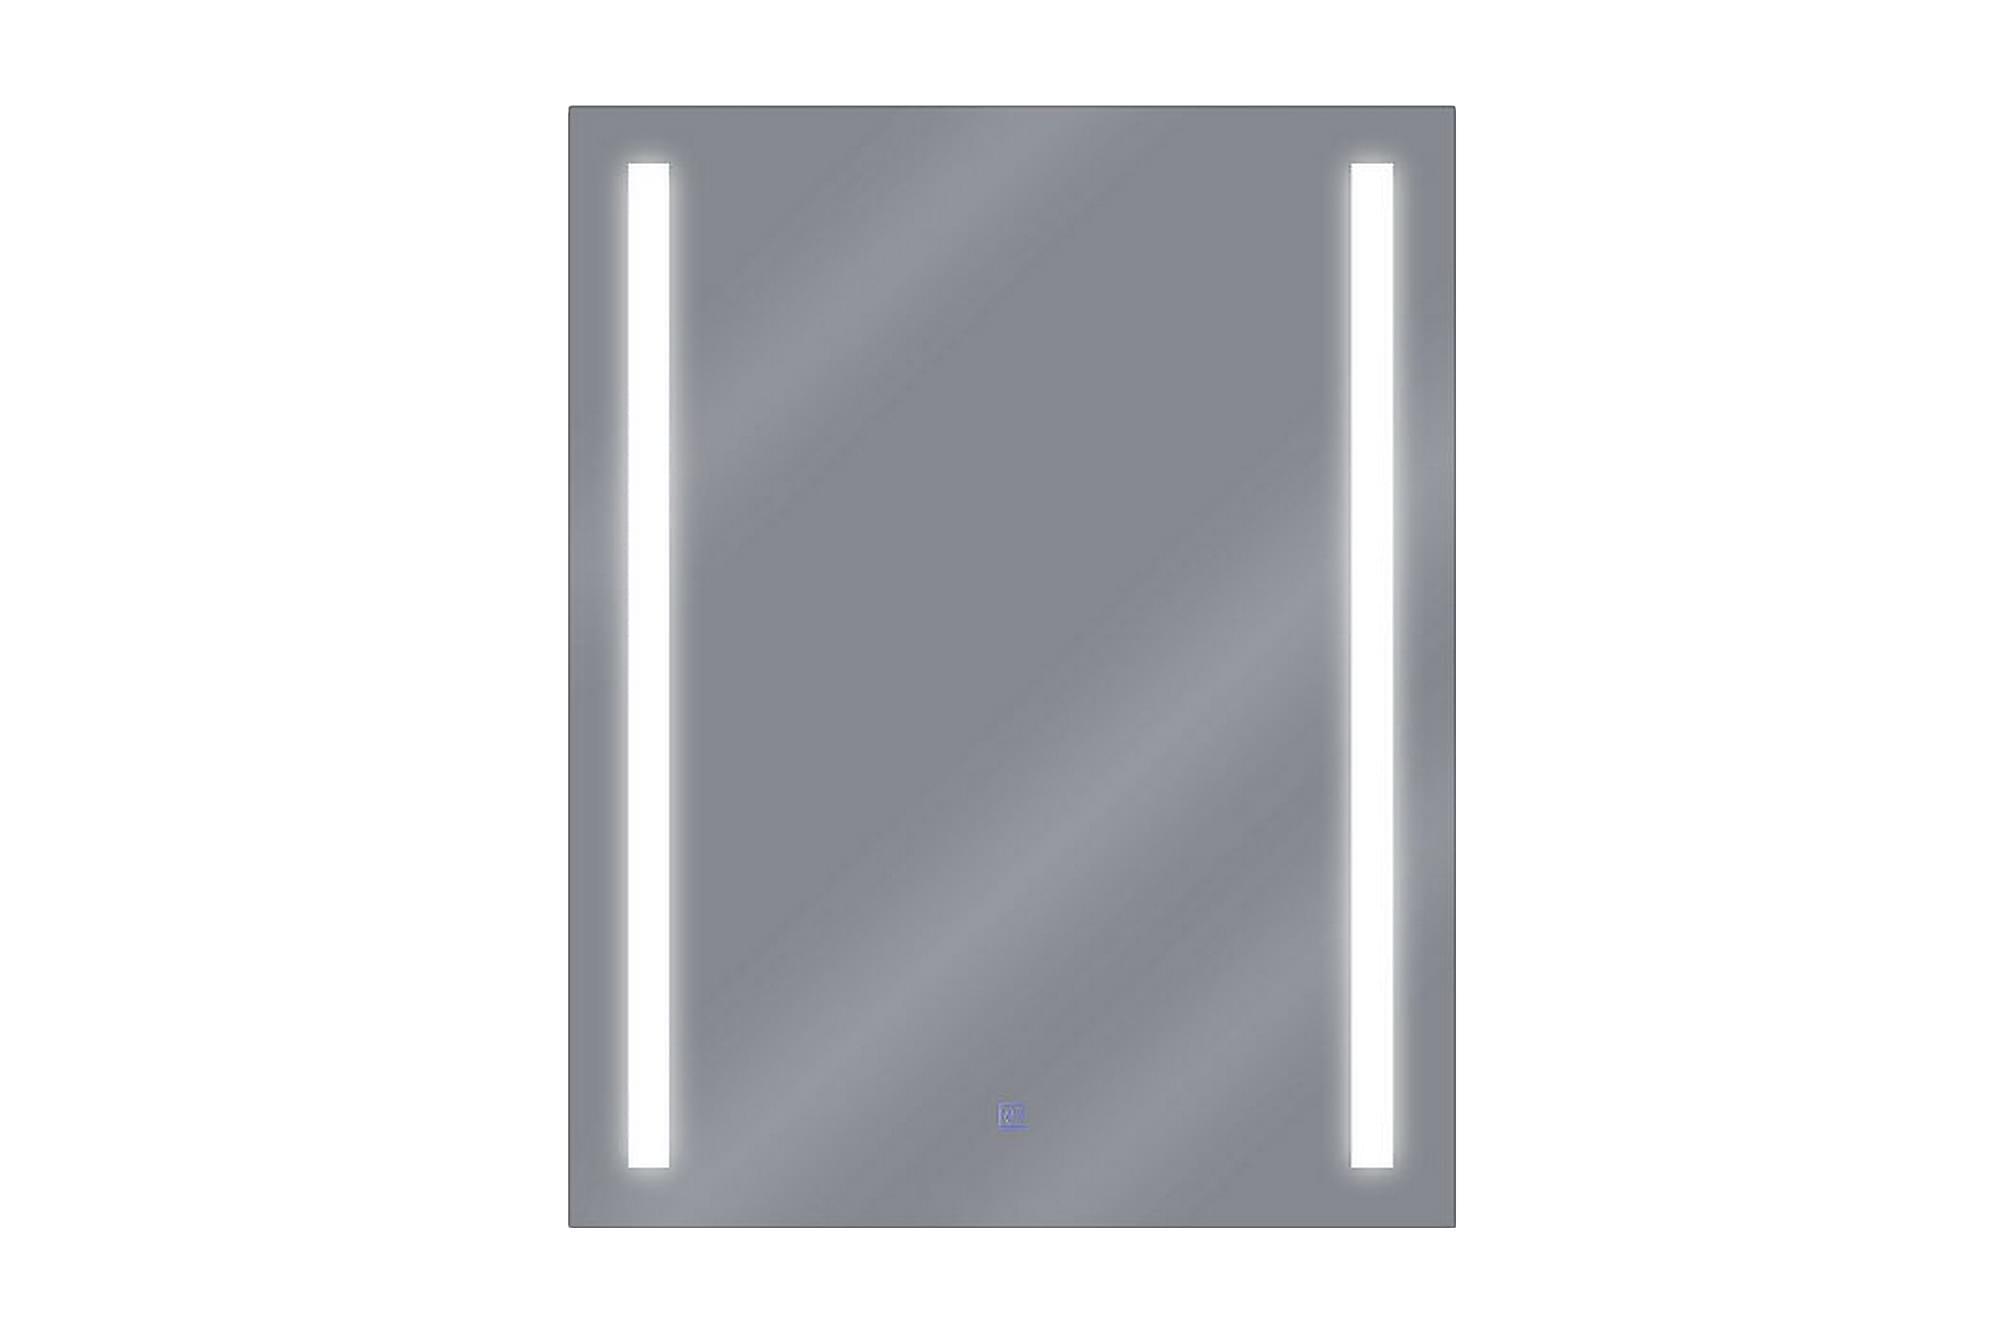 ARELIZ Spegel LED 60x80 cm Silver, Speglar